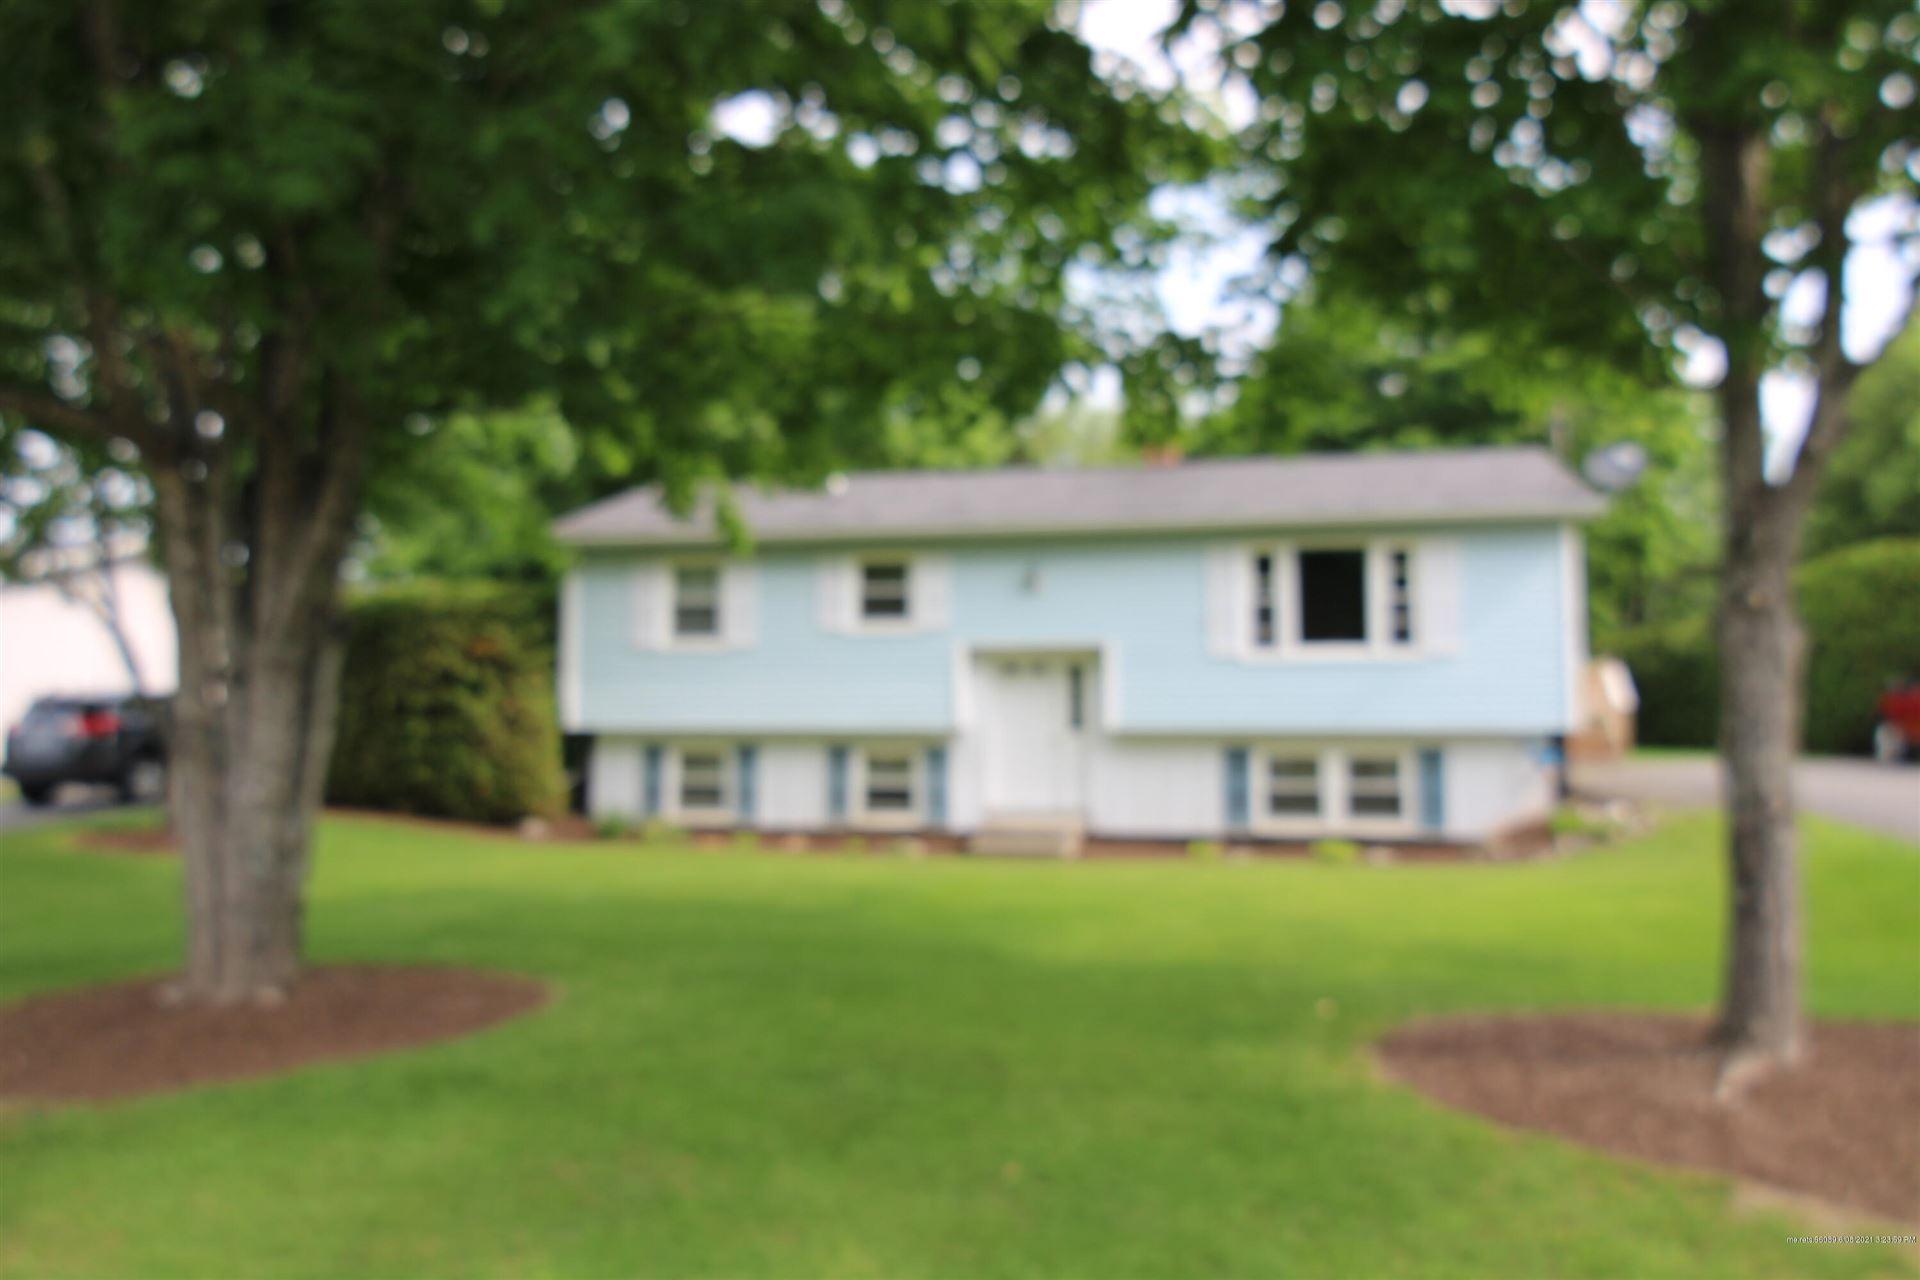 Photo of 5 Coventry Court, Presque Isle, ME 04769 (MLS # 1494706)